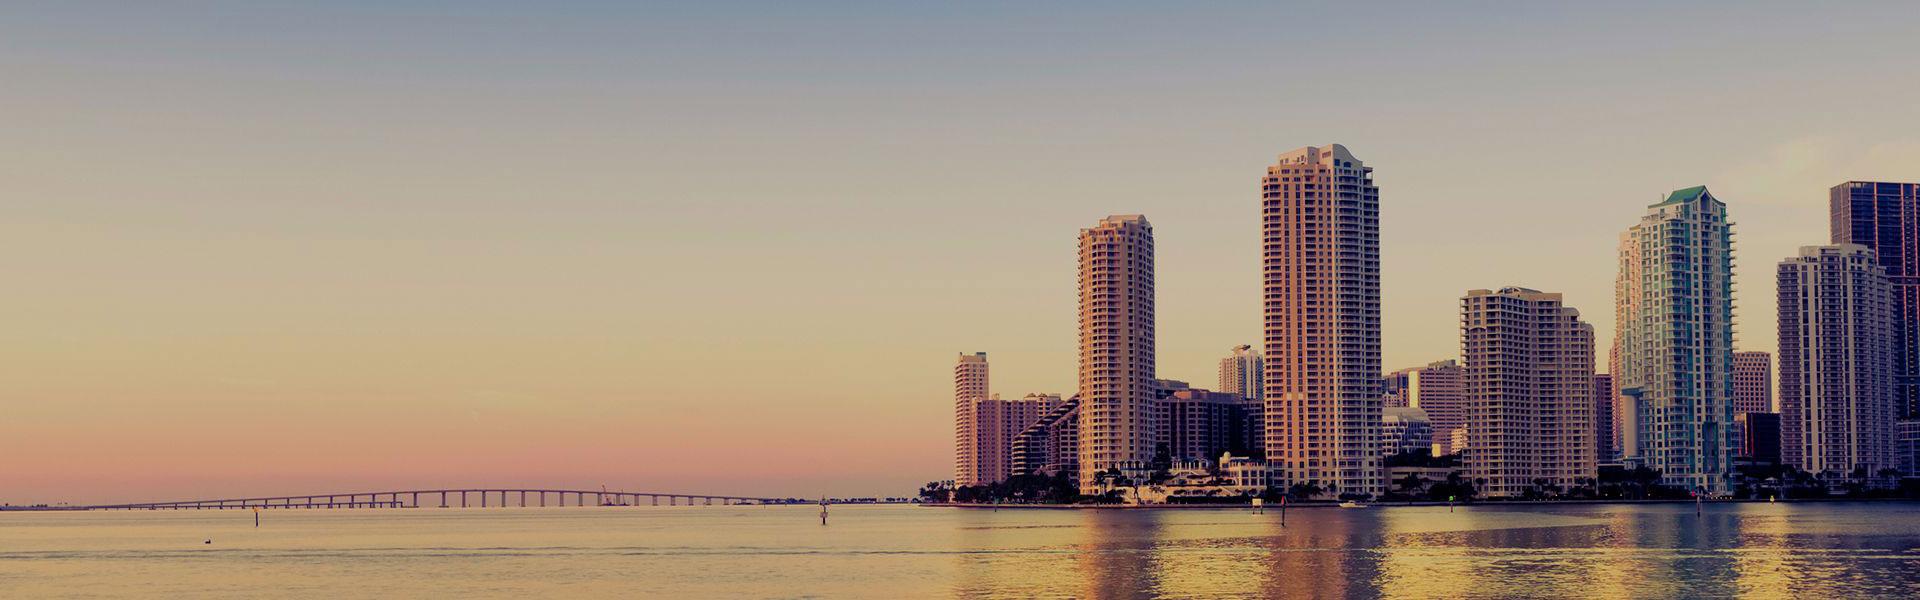 Miami Beach View Skyline